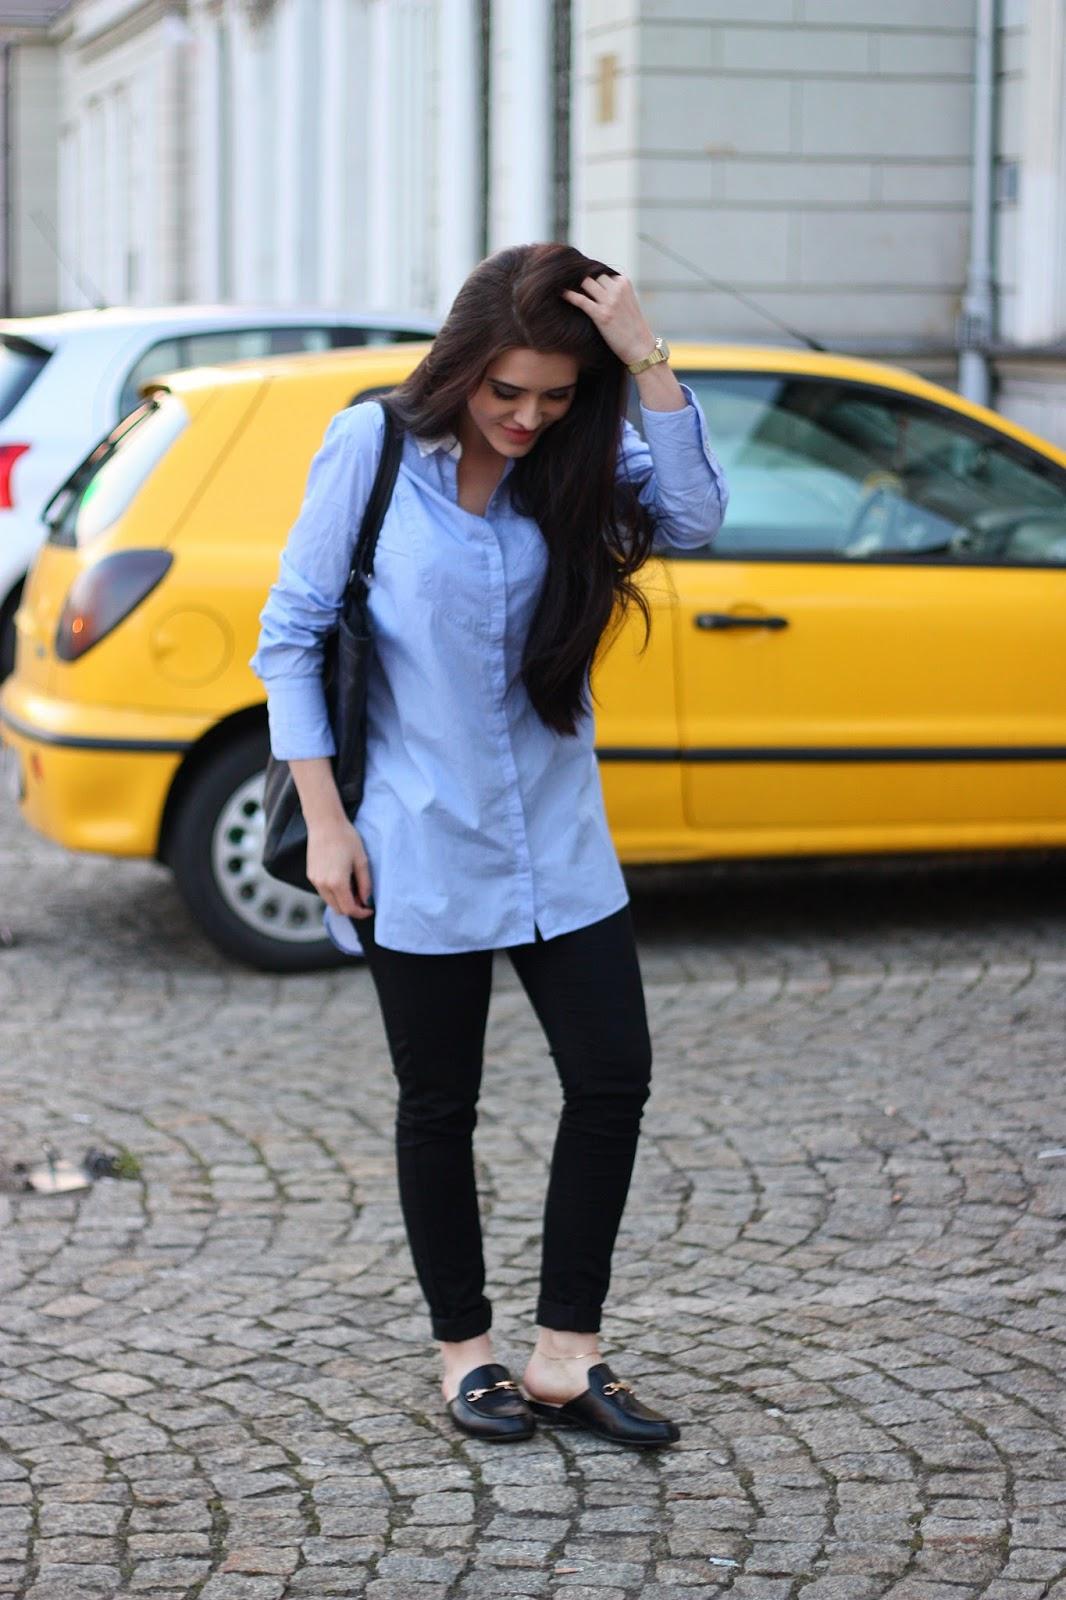 Blue shirt u0026 black jeans - Justyna Lis